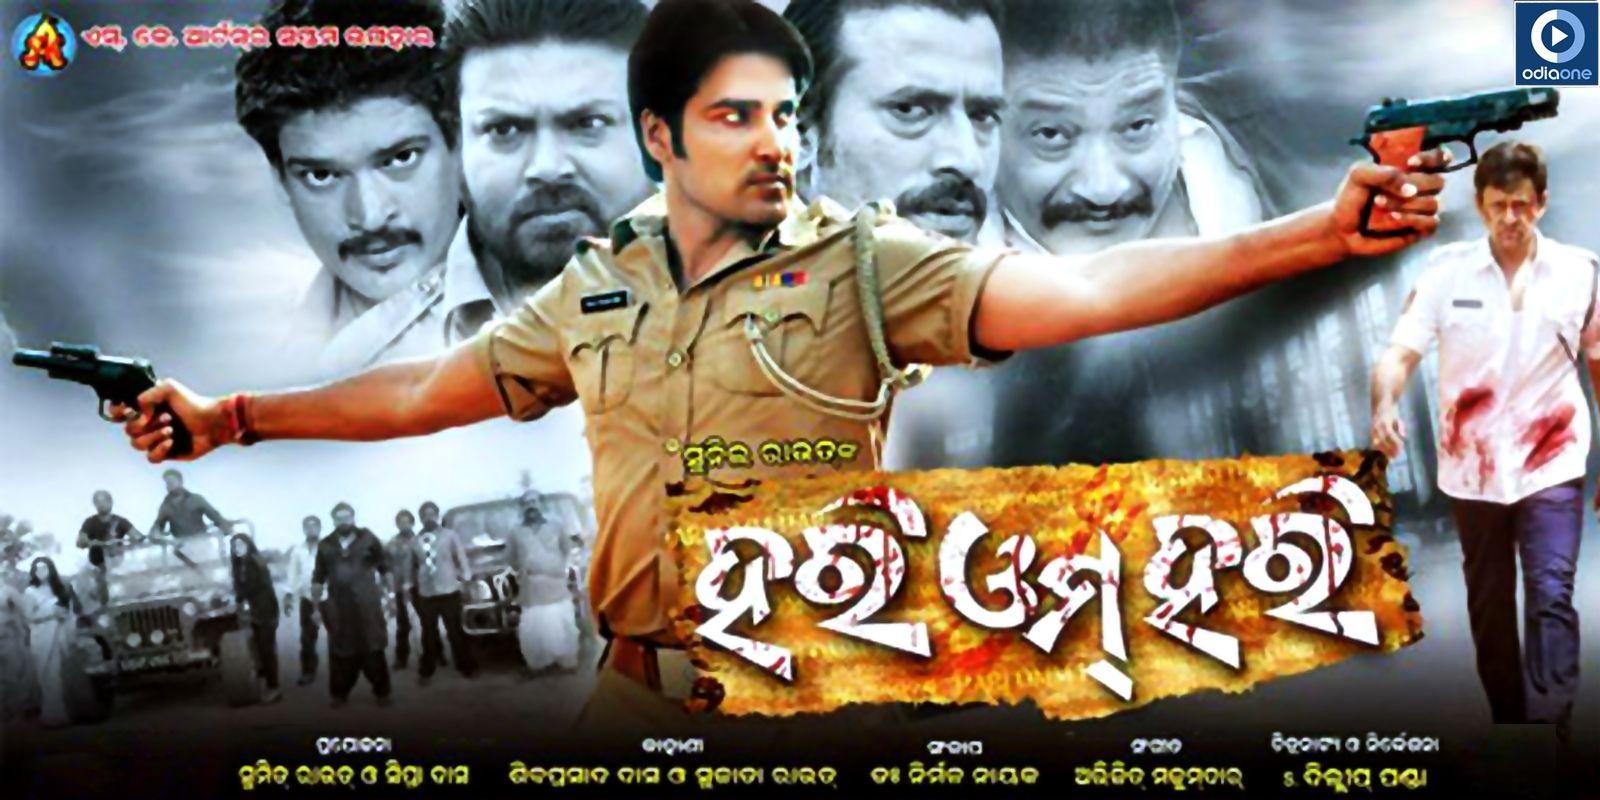 Hari Om Hari Ringtone Download Movie Songs Movies Mp Song Om